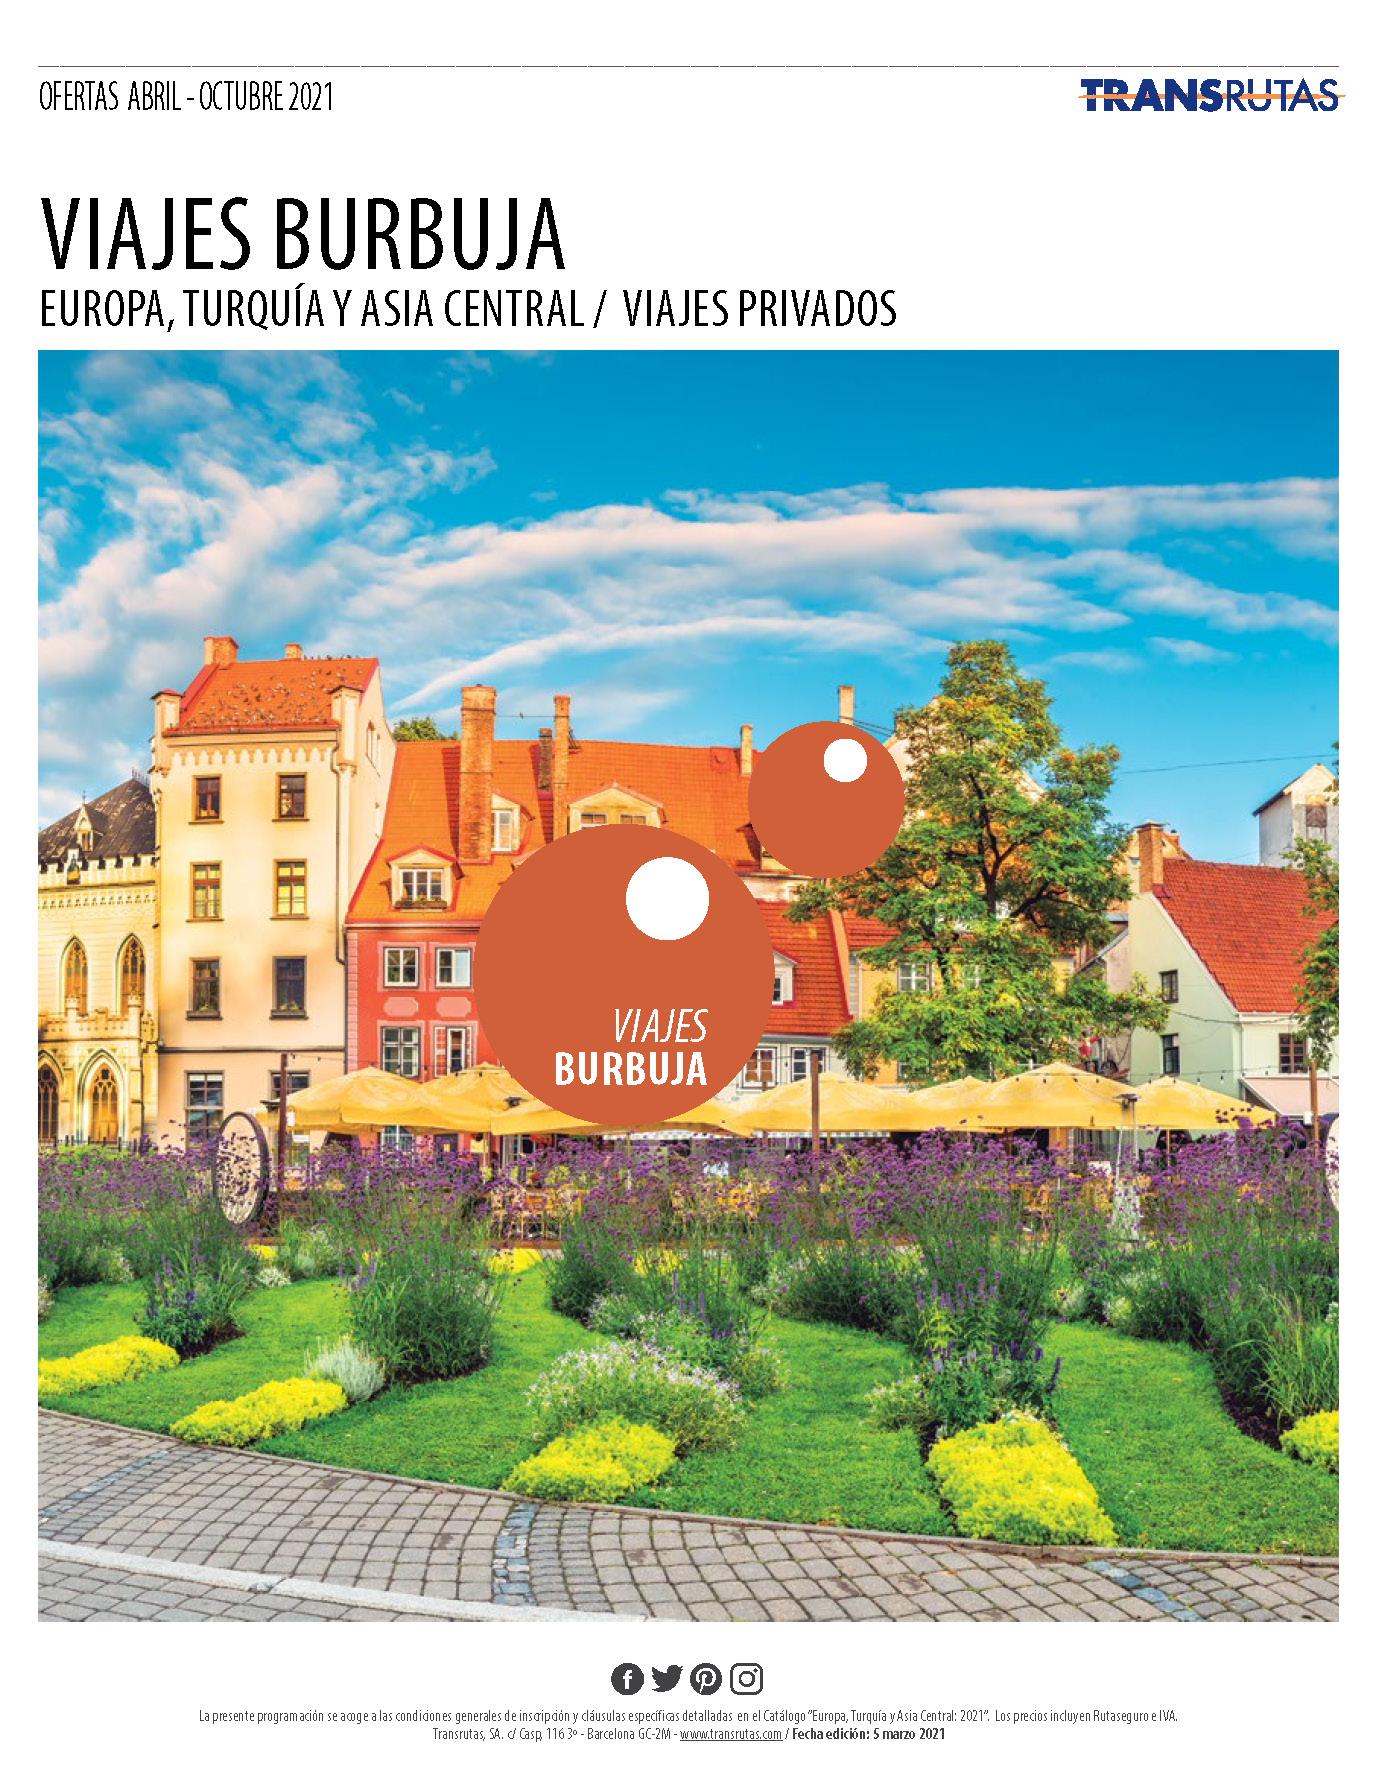 Catalogo Transrutas Viajes Burbuja Europa Turquia y Asia Central 2021